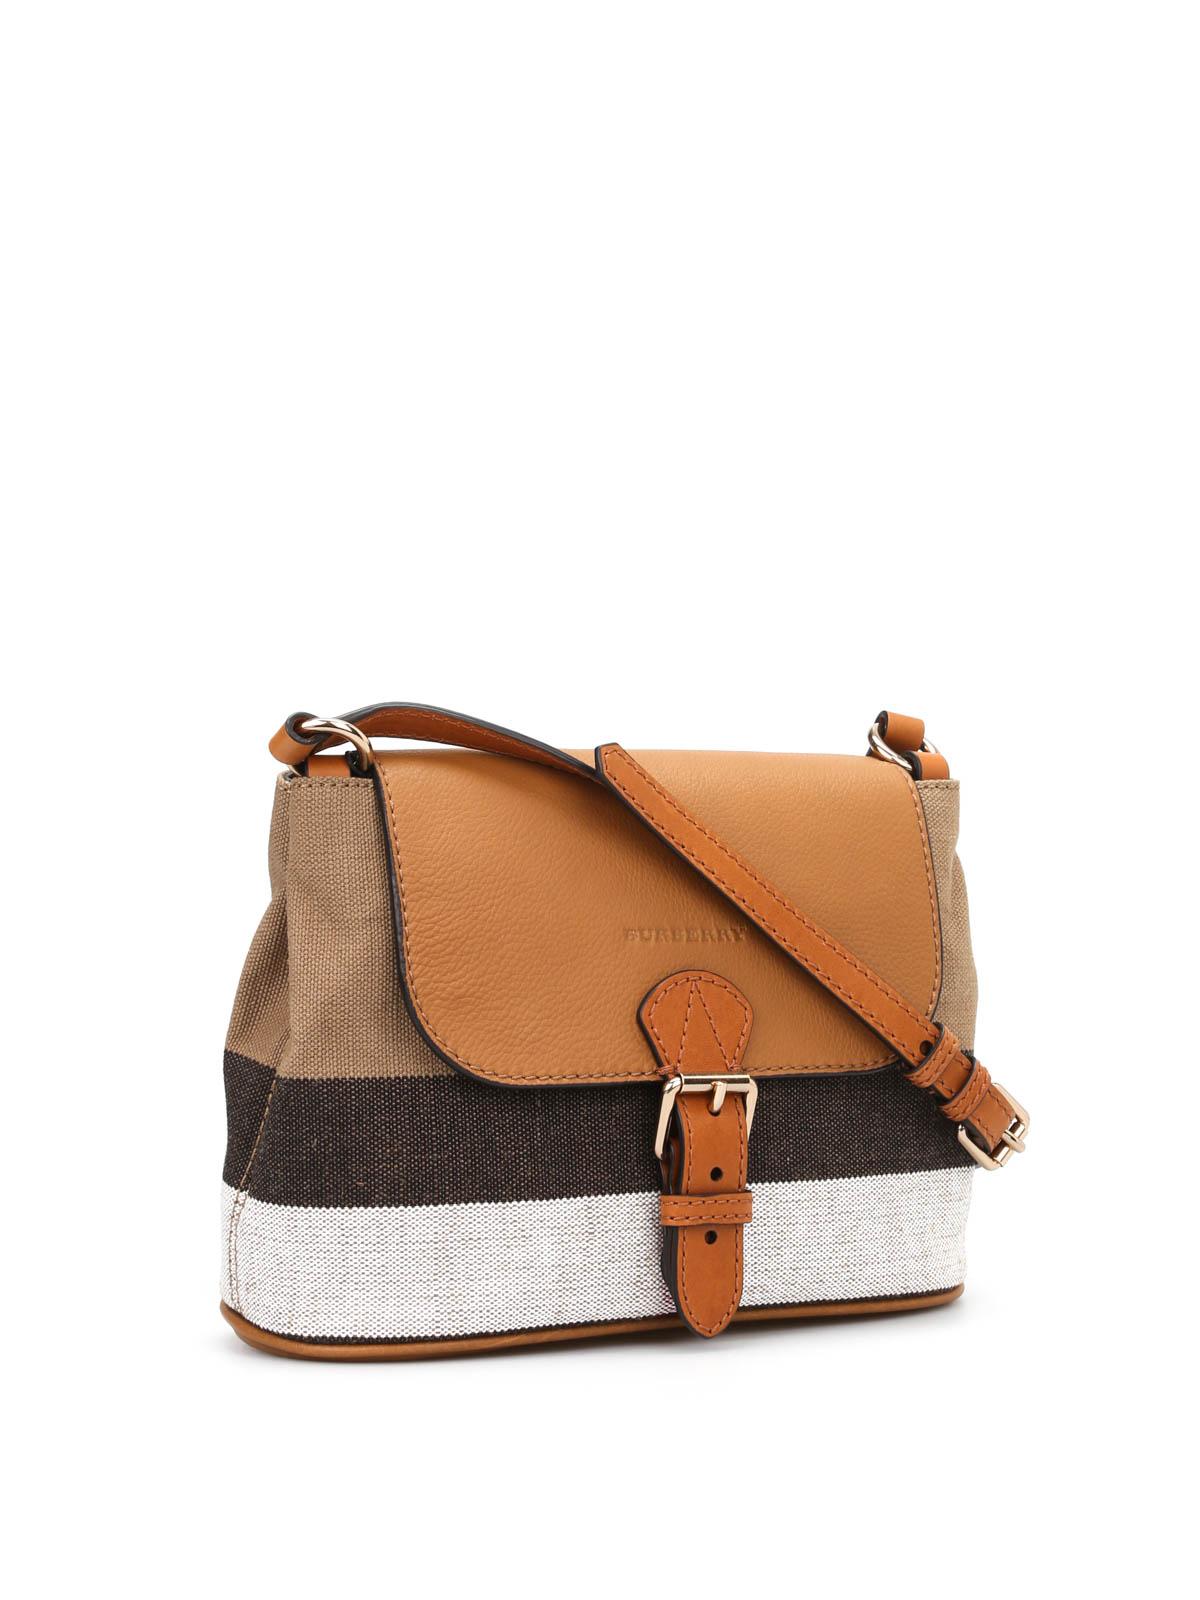 16ce864ff5d2 Burberry - Small Gowan canvas bag - cross body bags - 3992187 1